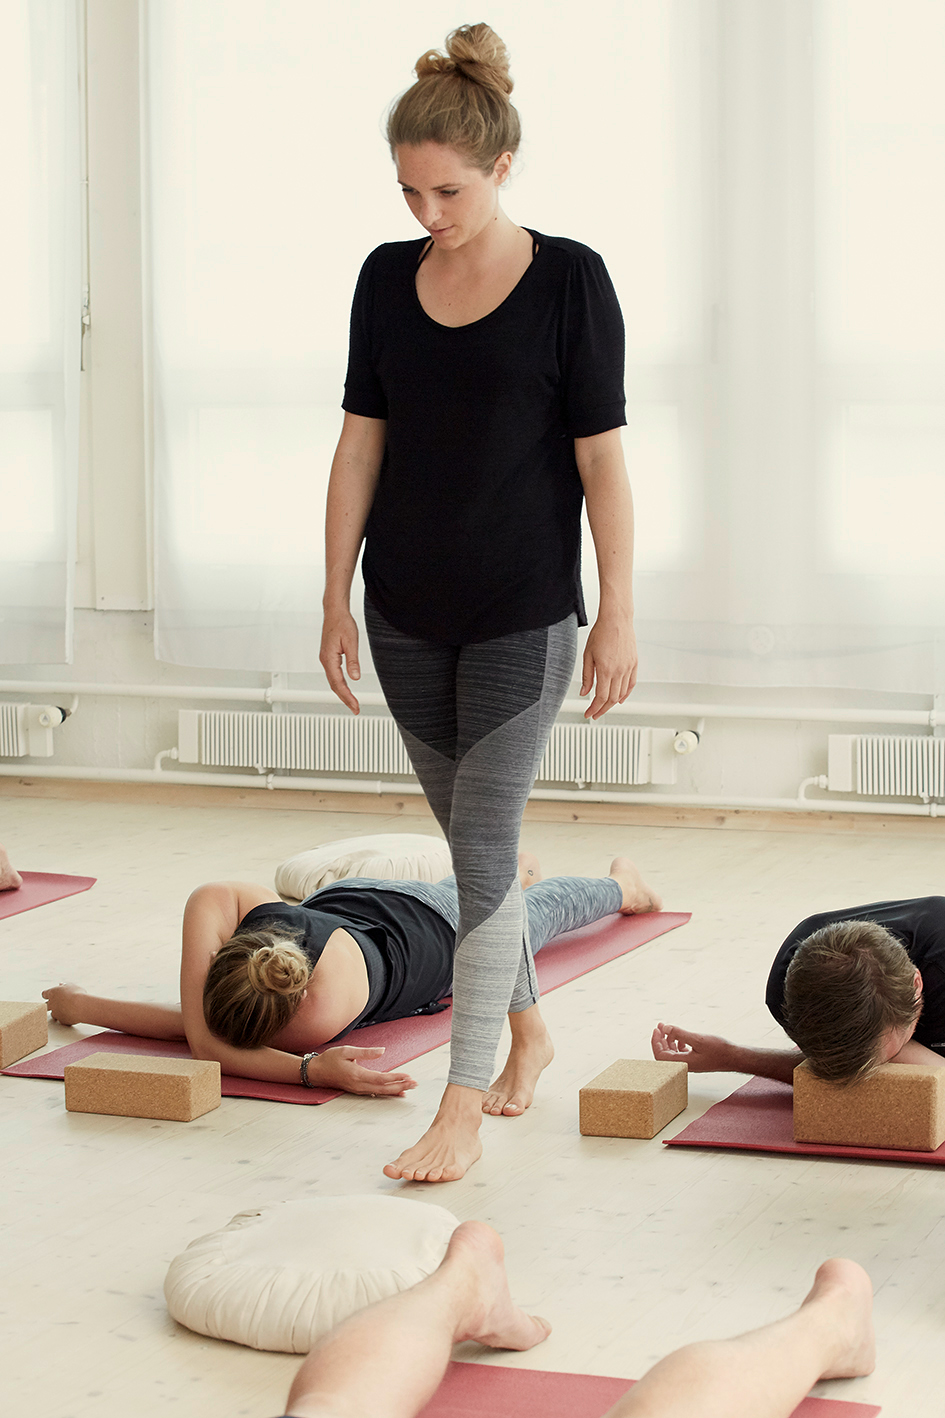 Links: - Yoga3 StudioSommeryoga FrauenbadiTheresa MoserAnita FaesDhugal MeachemYin YogaPaul Grilley